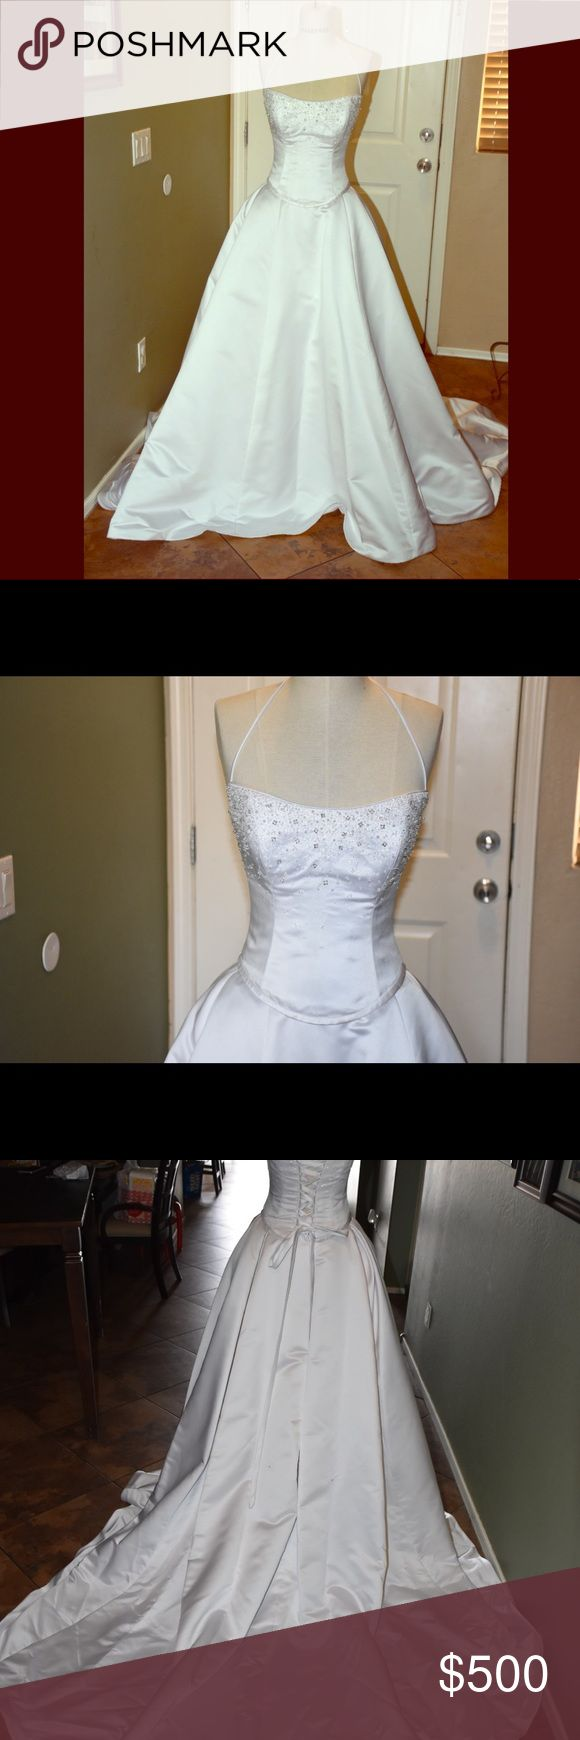 Pre owned wedding dress   best My Posh Picks images on Pinterest  Band Flip flop sandals